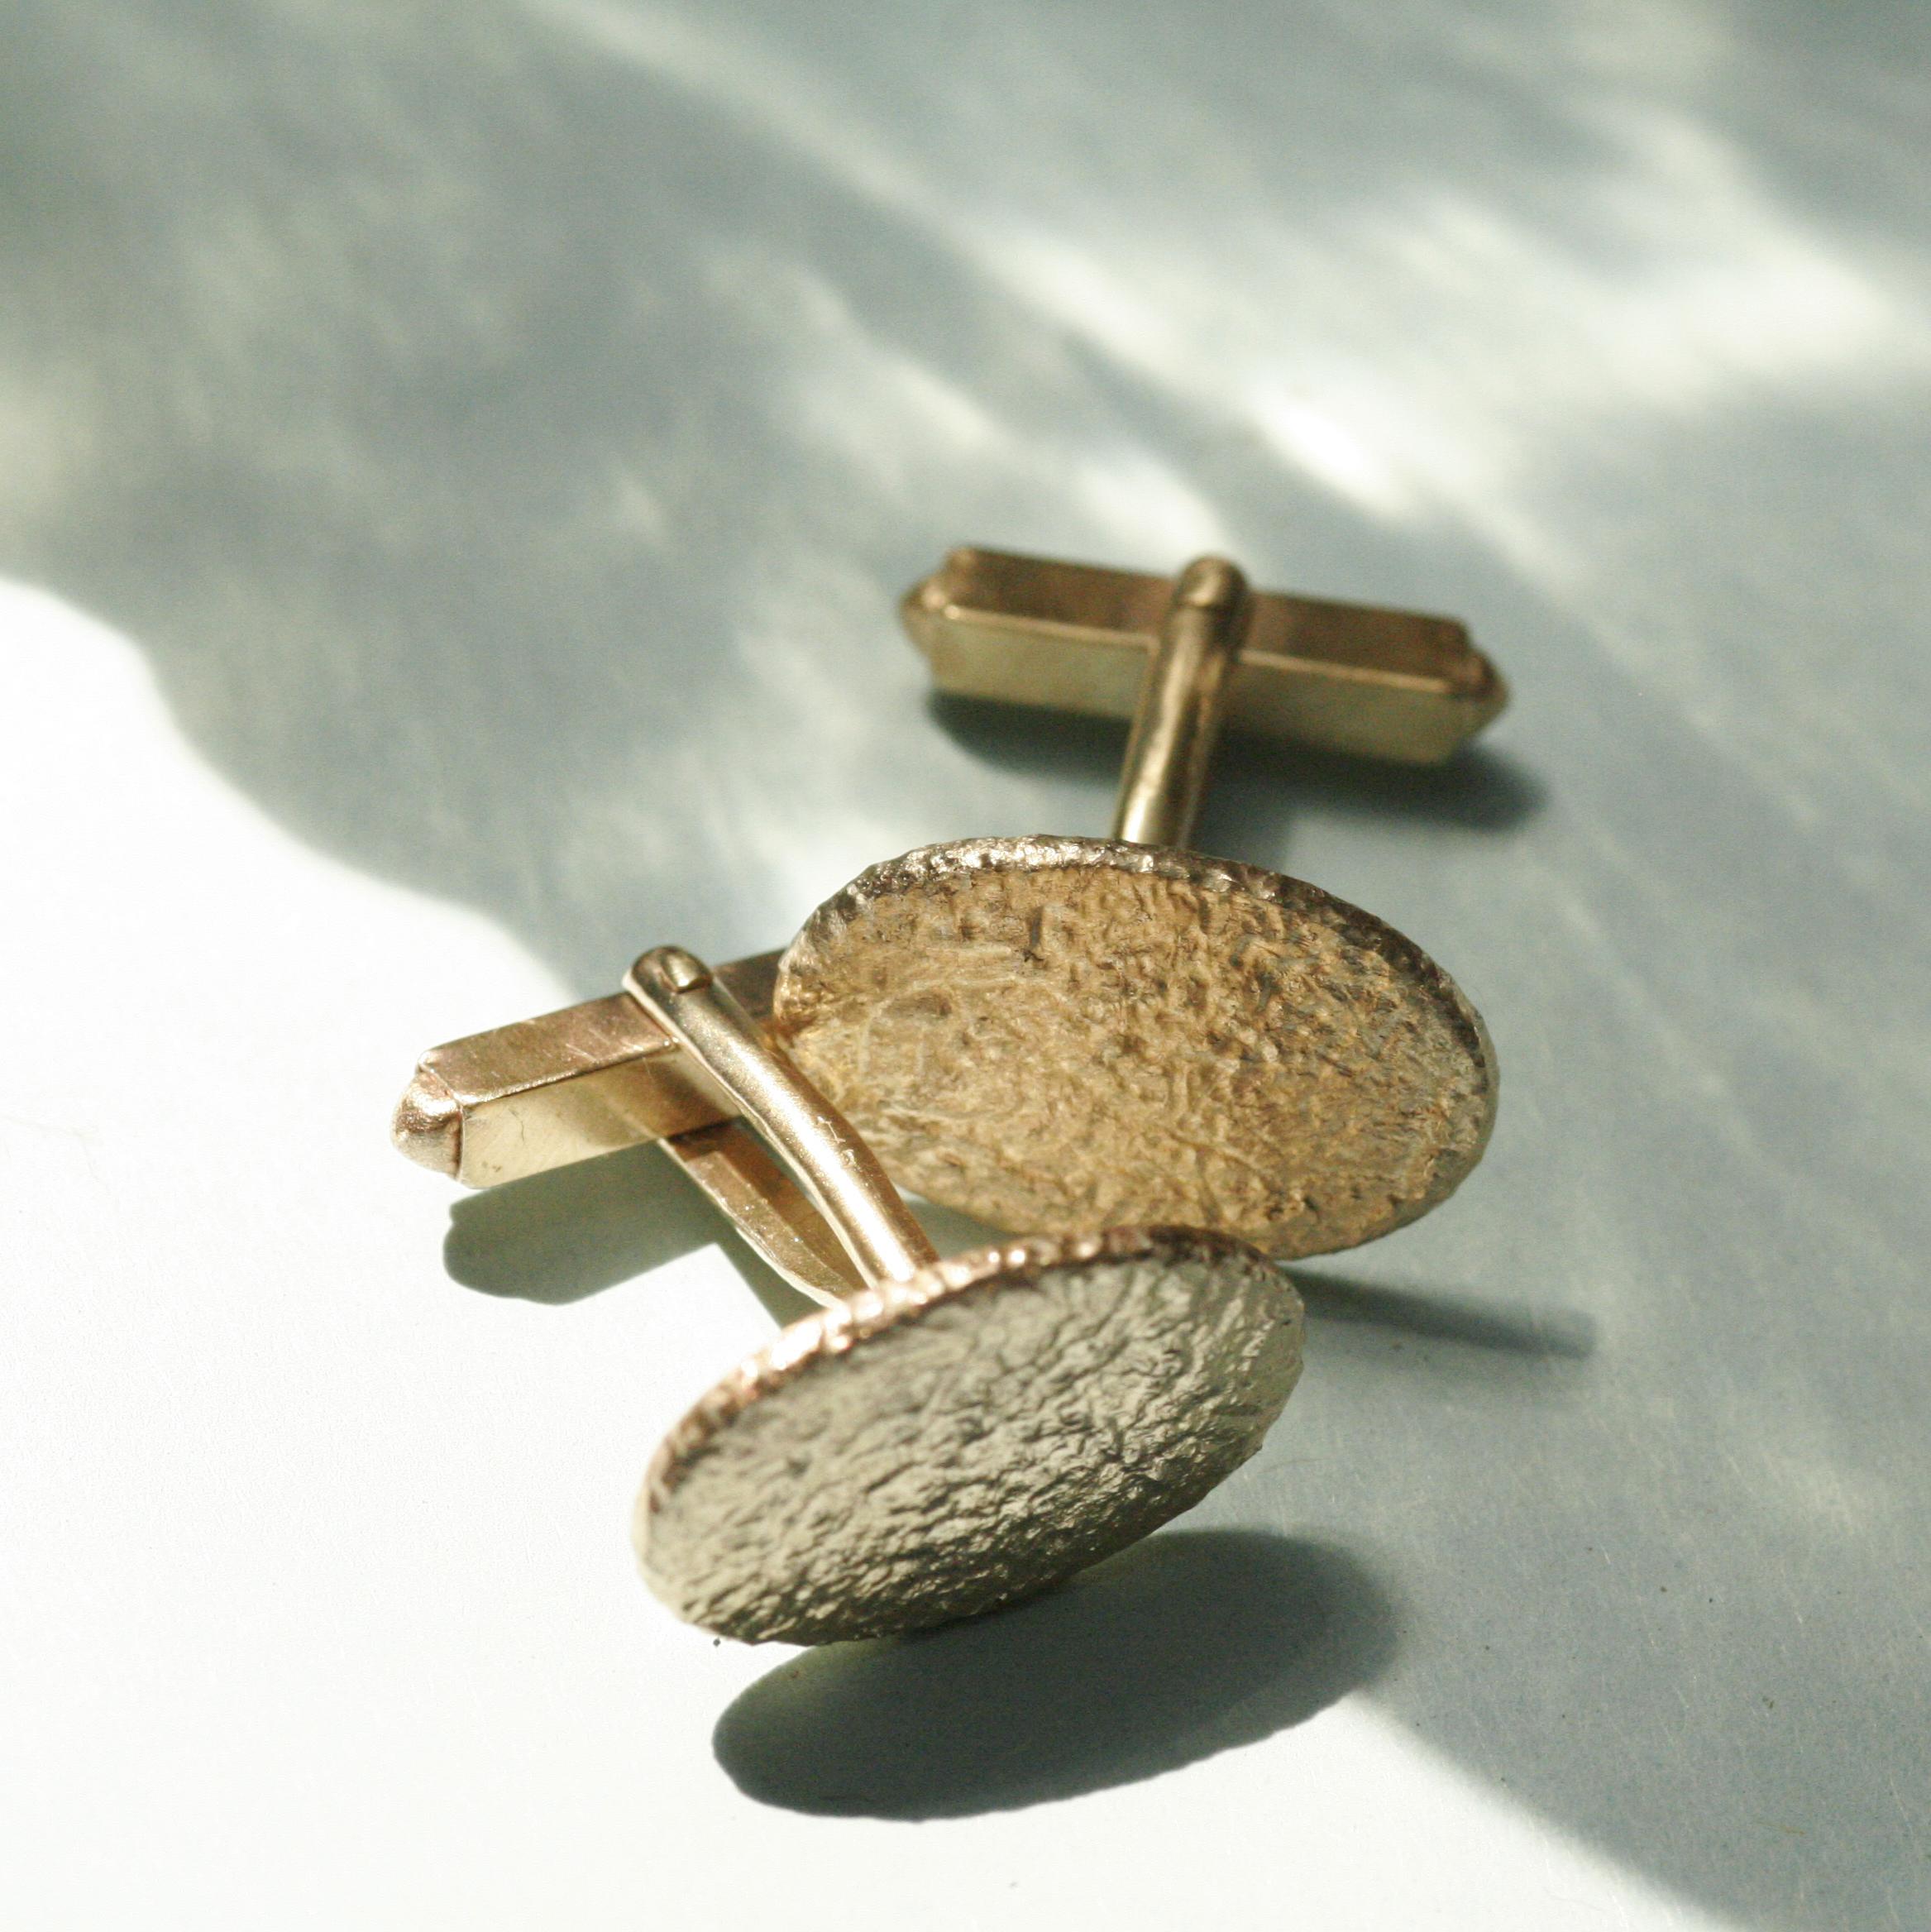 Gavroche 9ct Gold Cufflinks